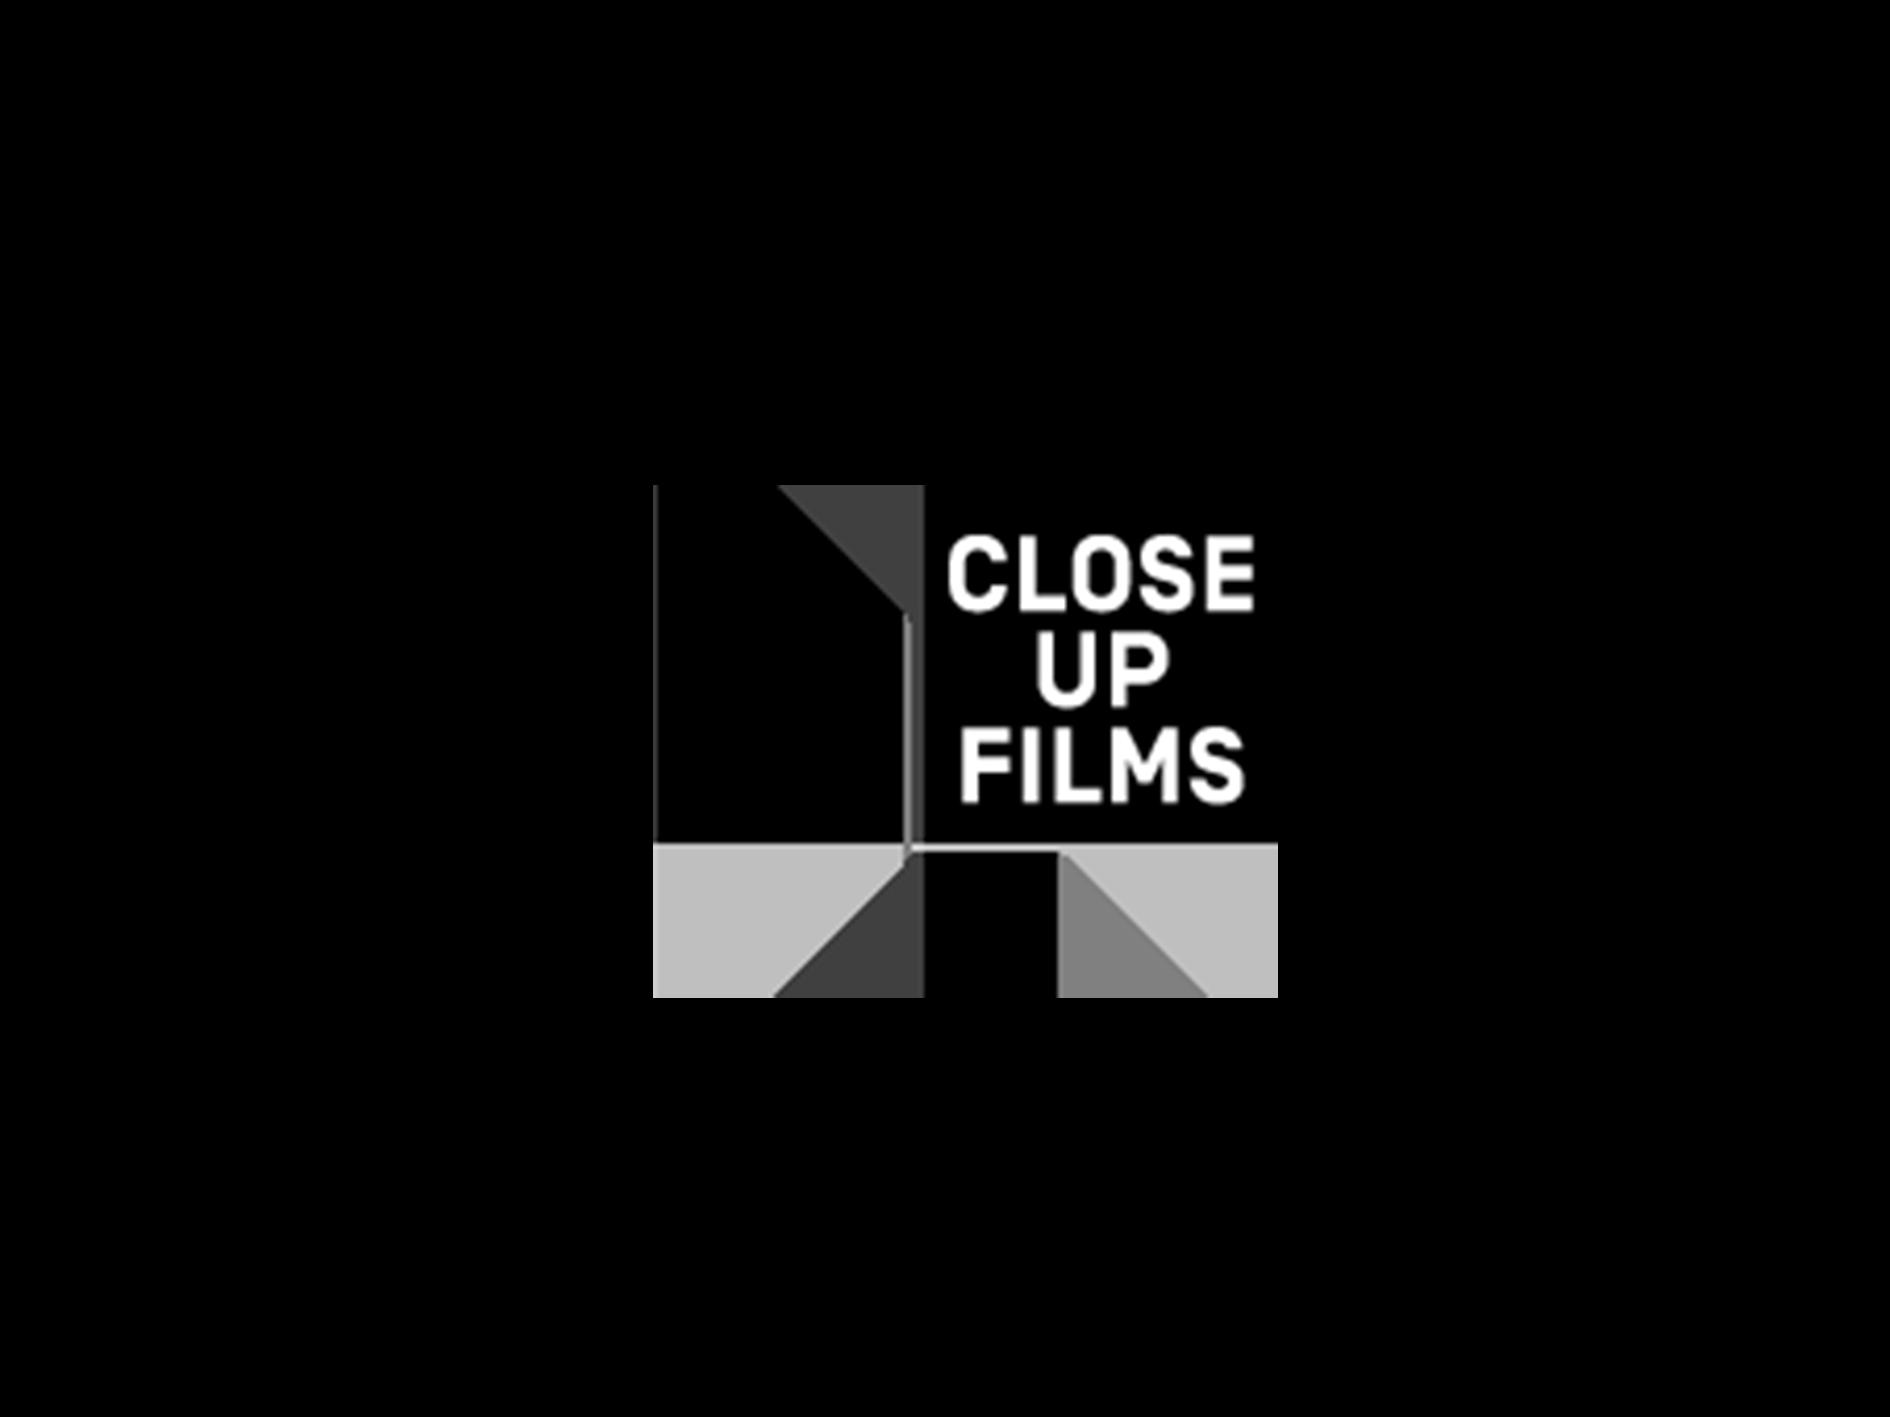 closeupfilms.ch